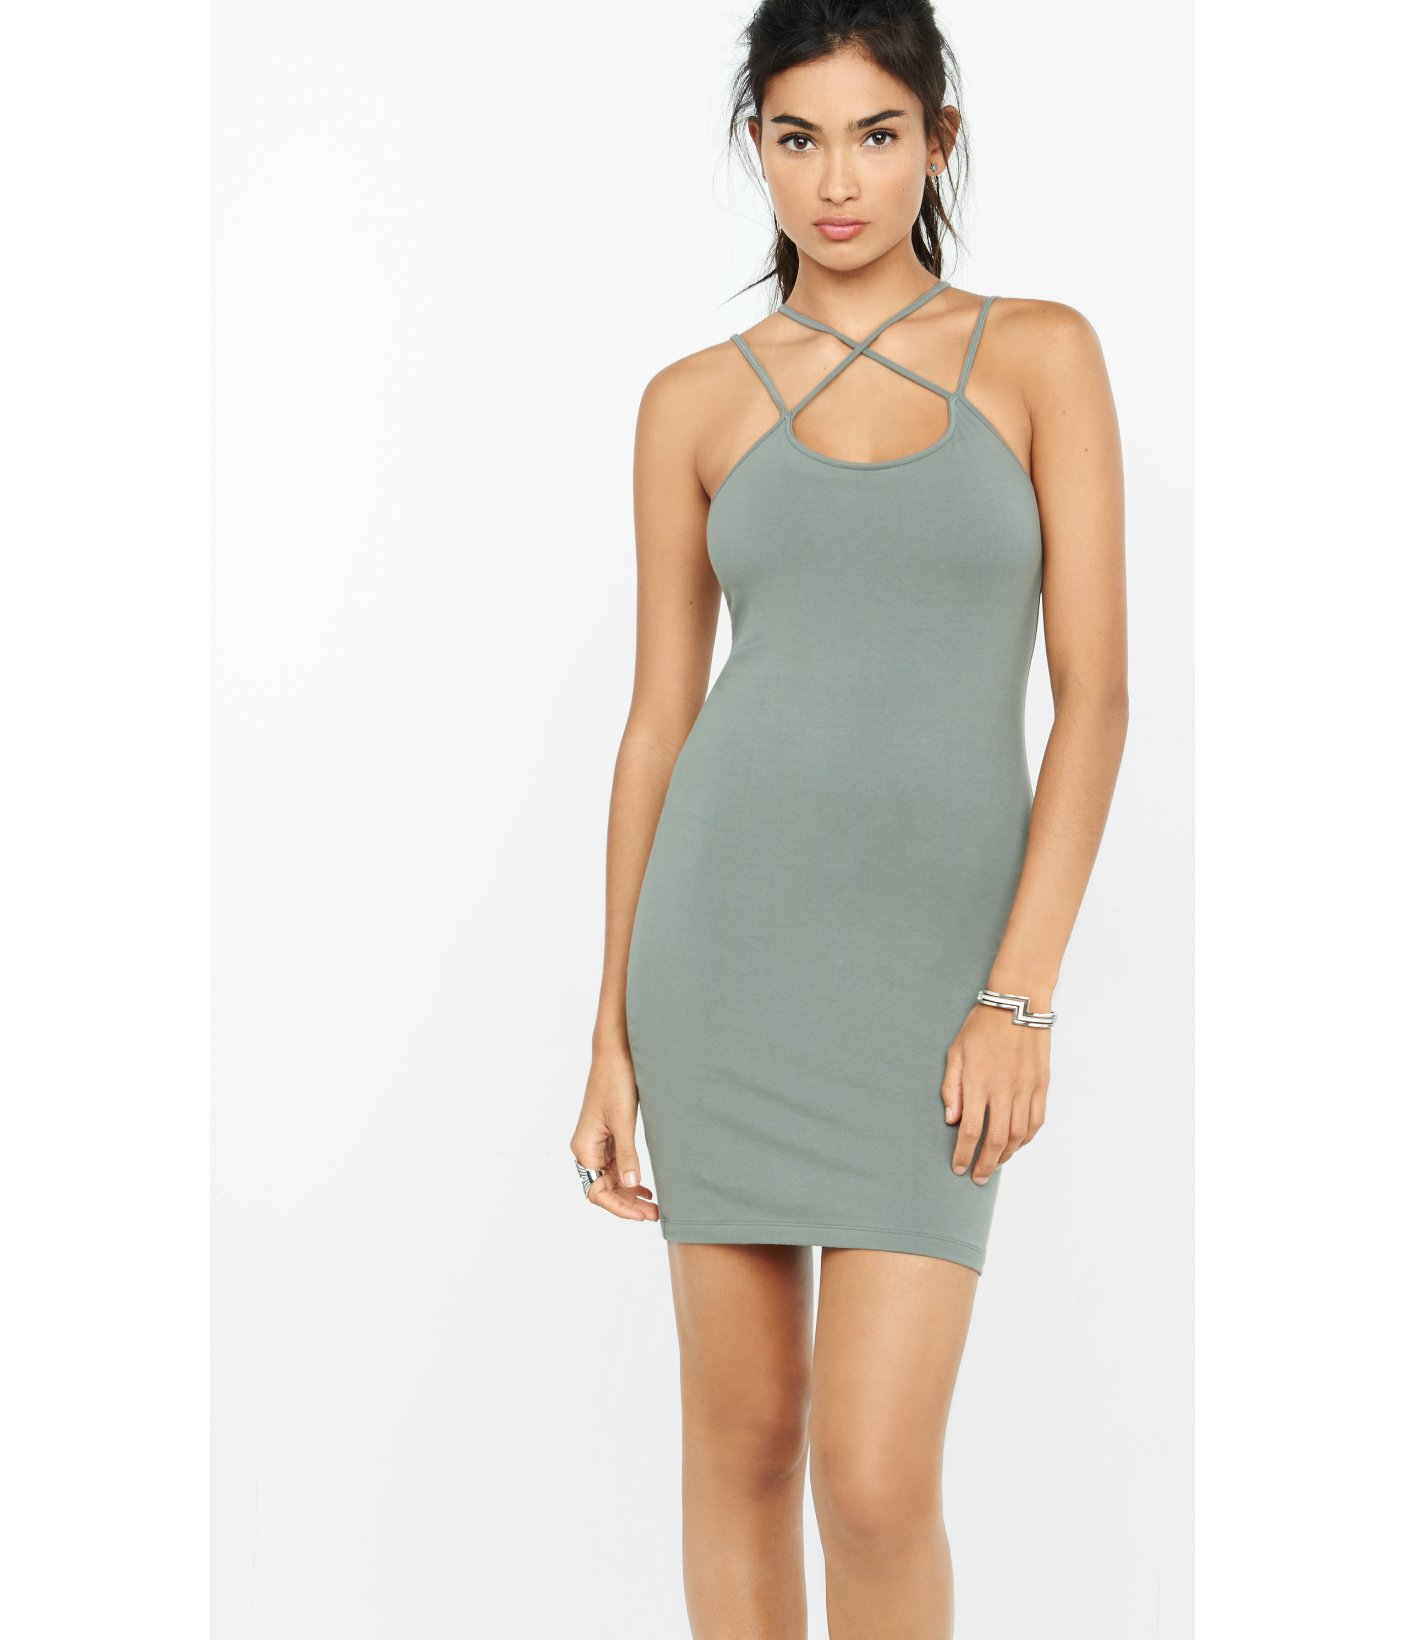 3a6ff9a5fd95 Express Strappy T-shirt Sheath Mini Dress in Green - Lyst